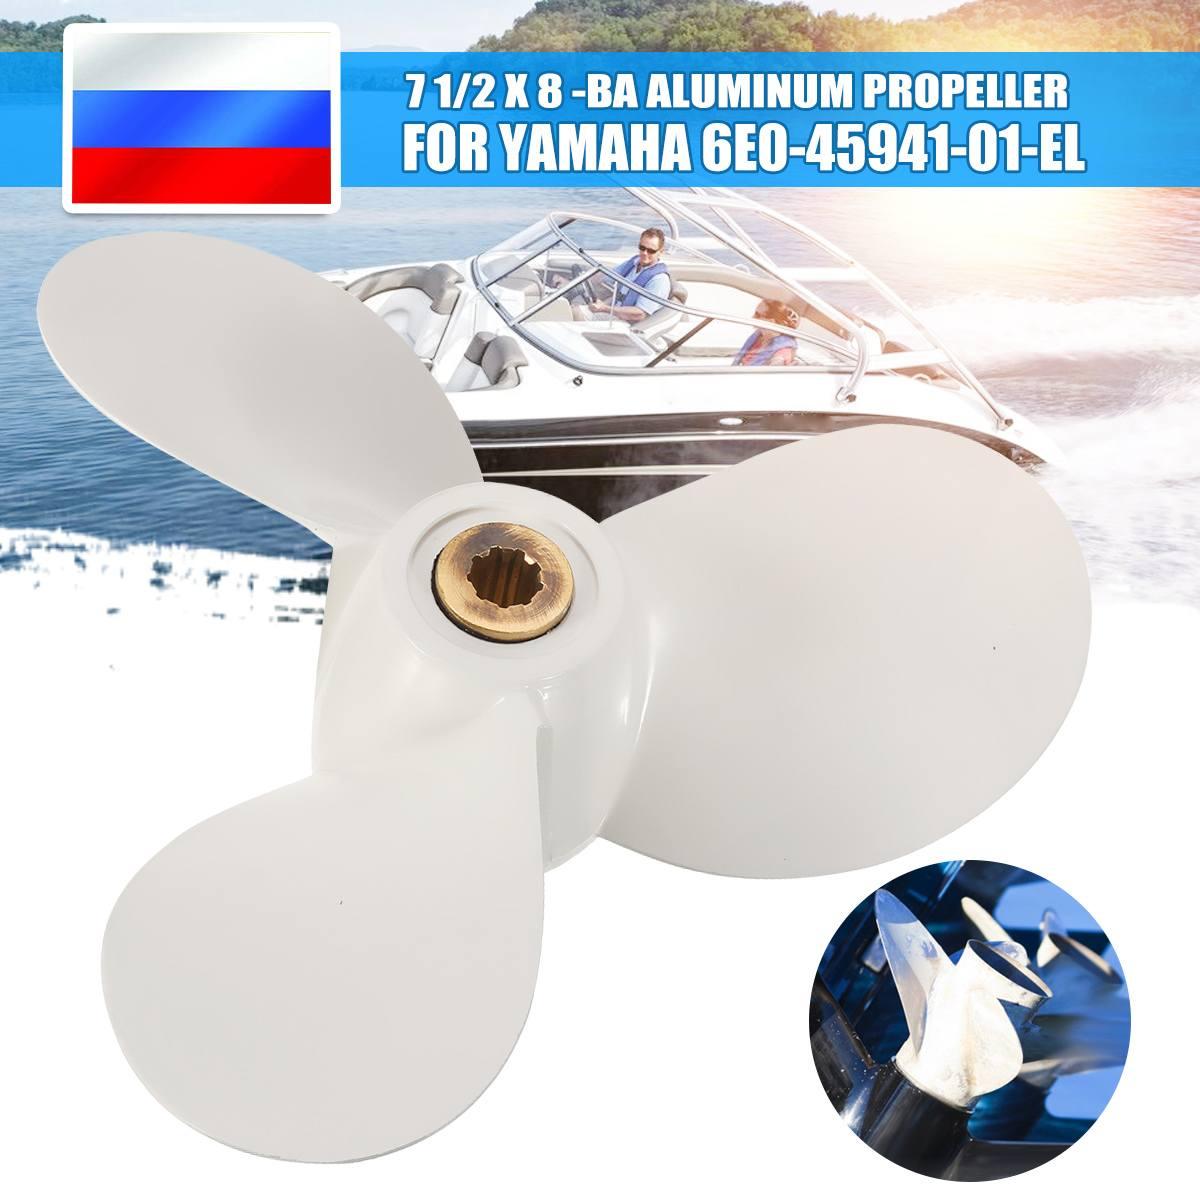 Marine Boat Engine Propeller For Yamaha Outboard Engine Part 71/2X 7-BA #6E0-45943-01-EL